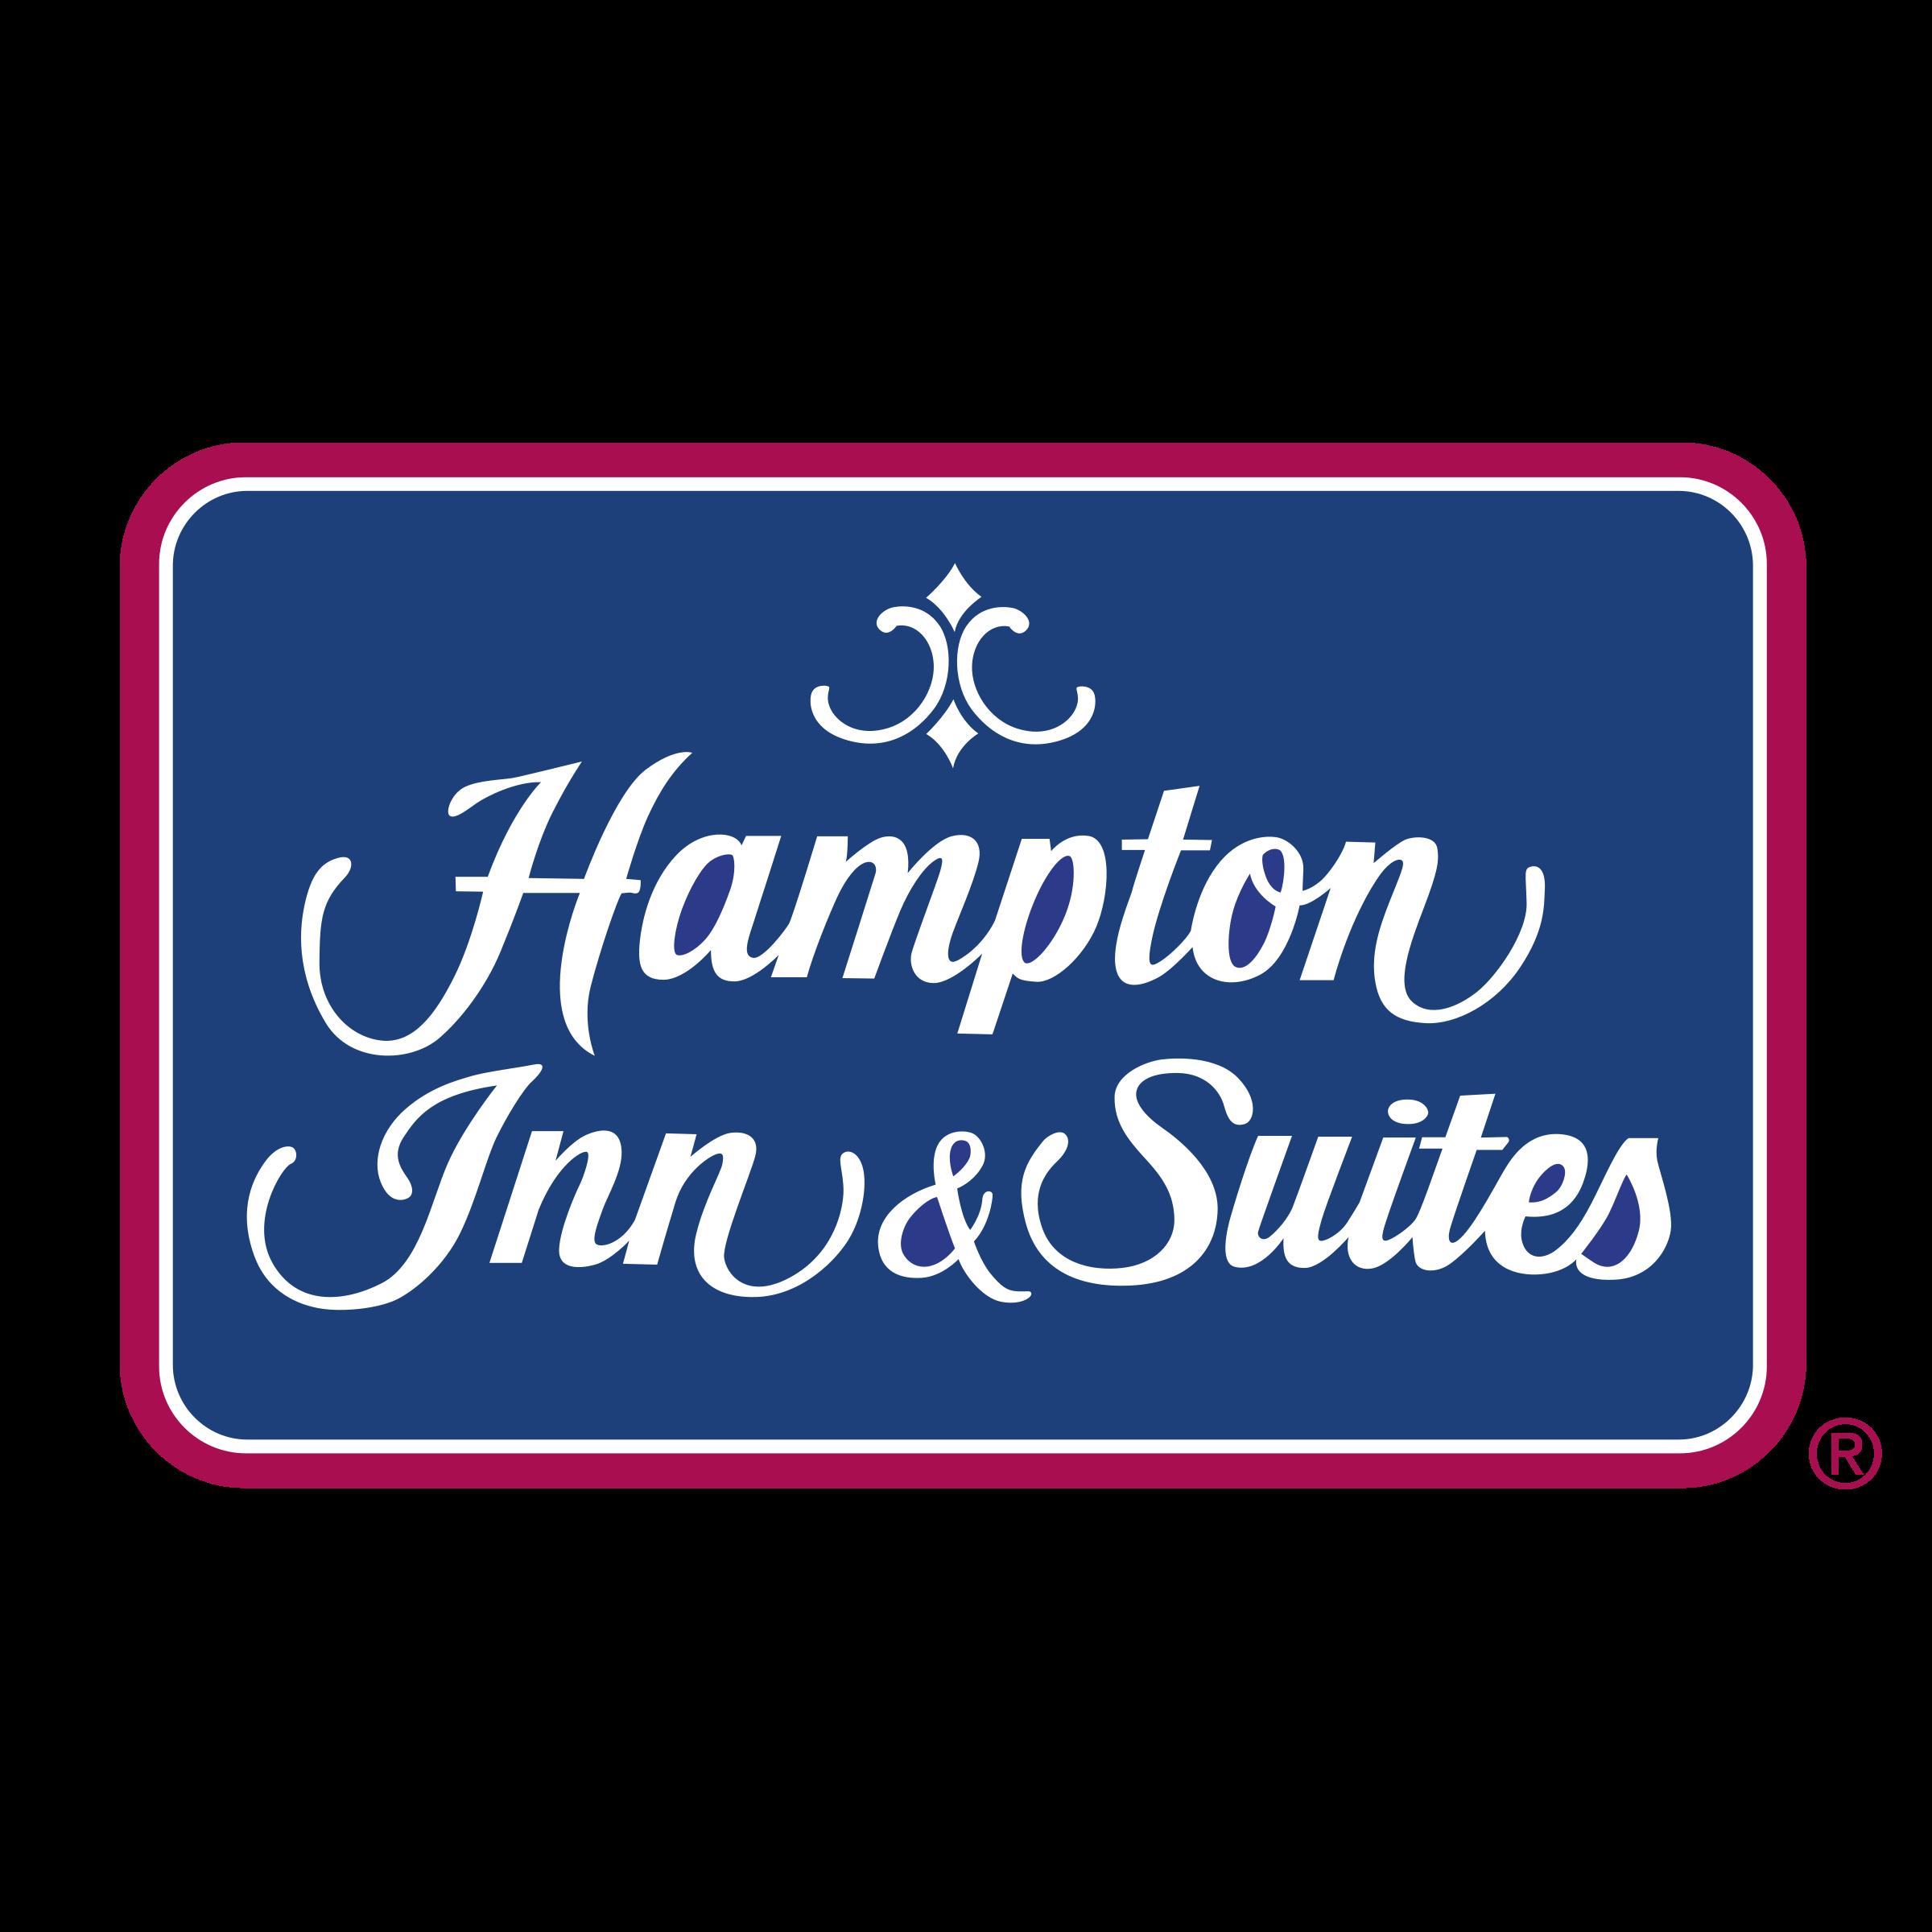 Hampton Inn & Suites Logo PNG Transparent & SVG Vector.